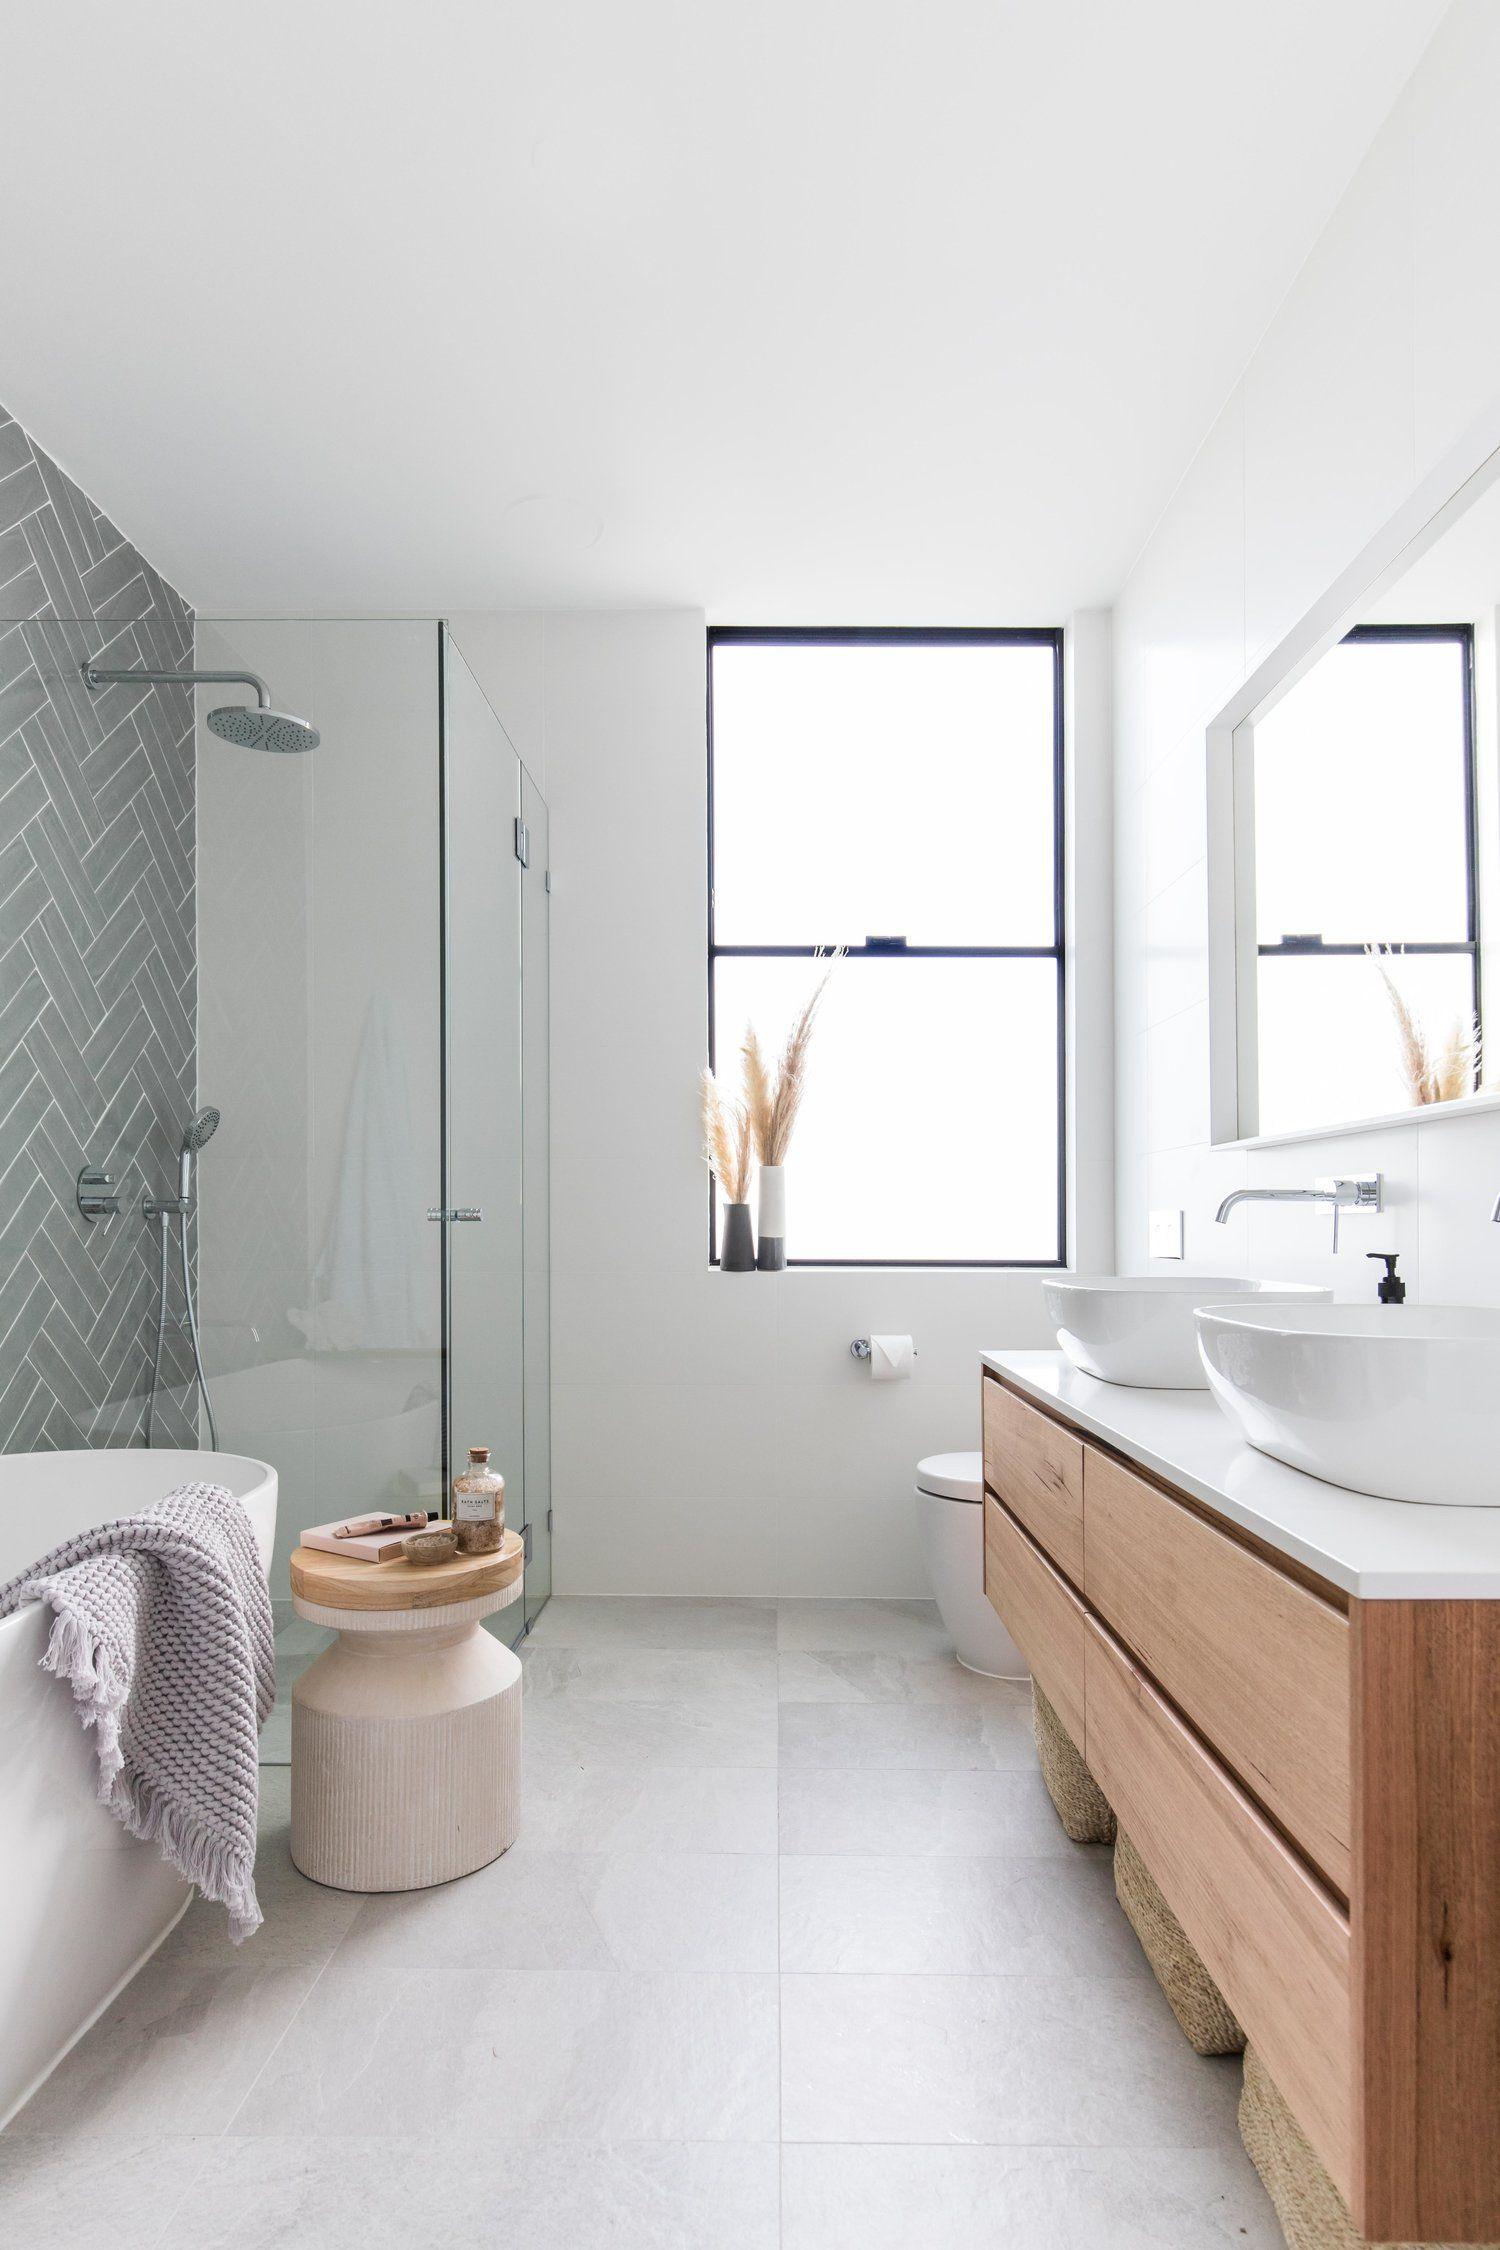 Small Apartment Decor Smallapartmentdecor Instagram Posts Videos Stories On Stalkingram Com Bathroom Design Trends